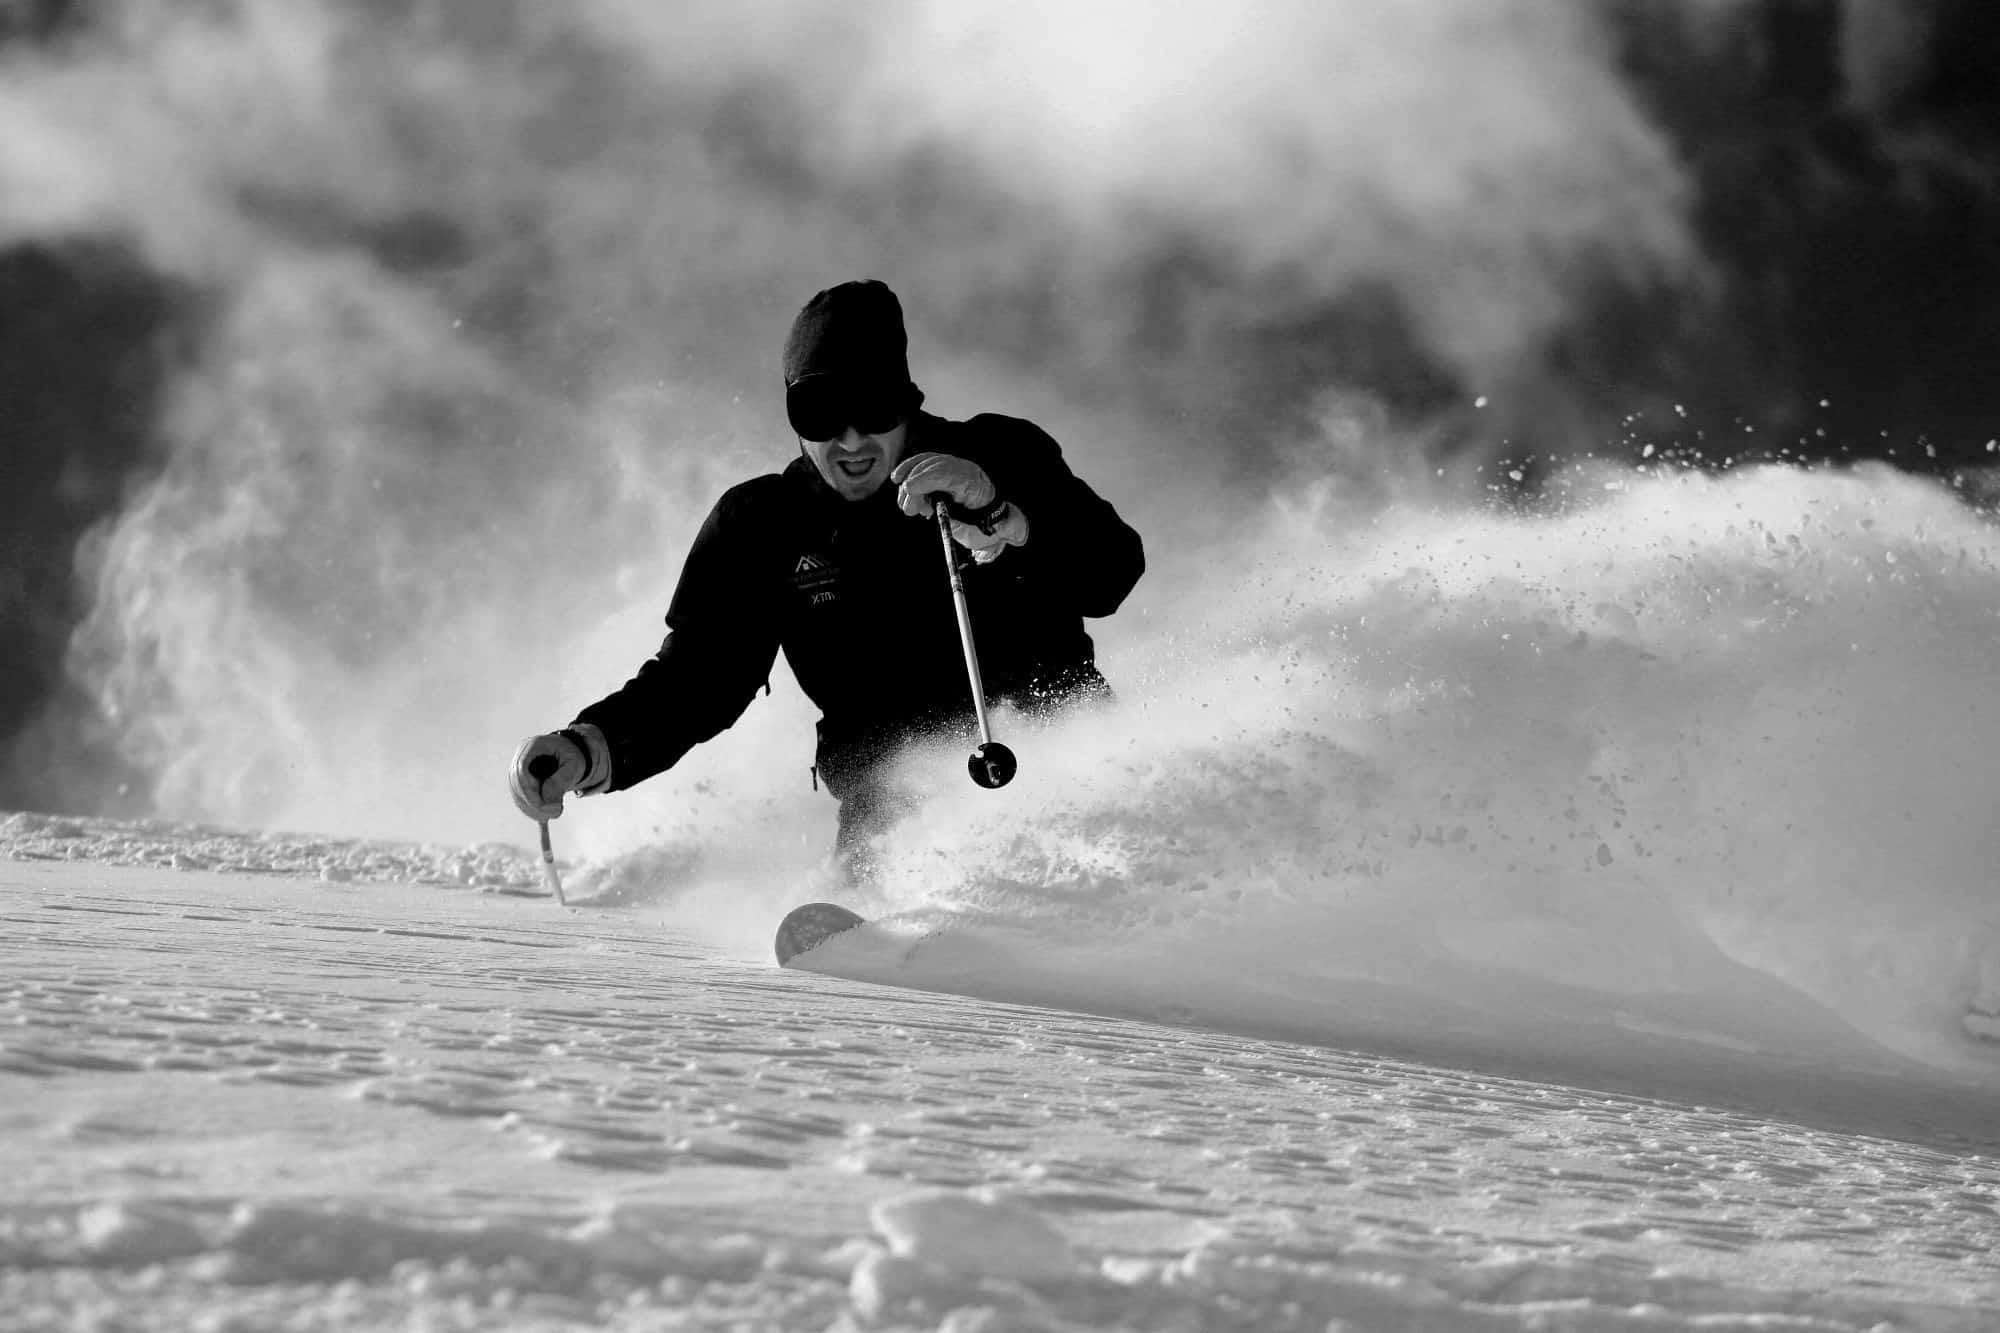 Aussie Ski Legend Steve Lee Suffers a Major Stroke - Fundraiser Launched